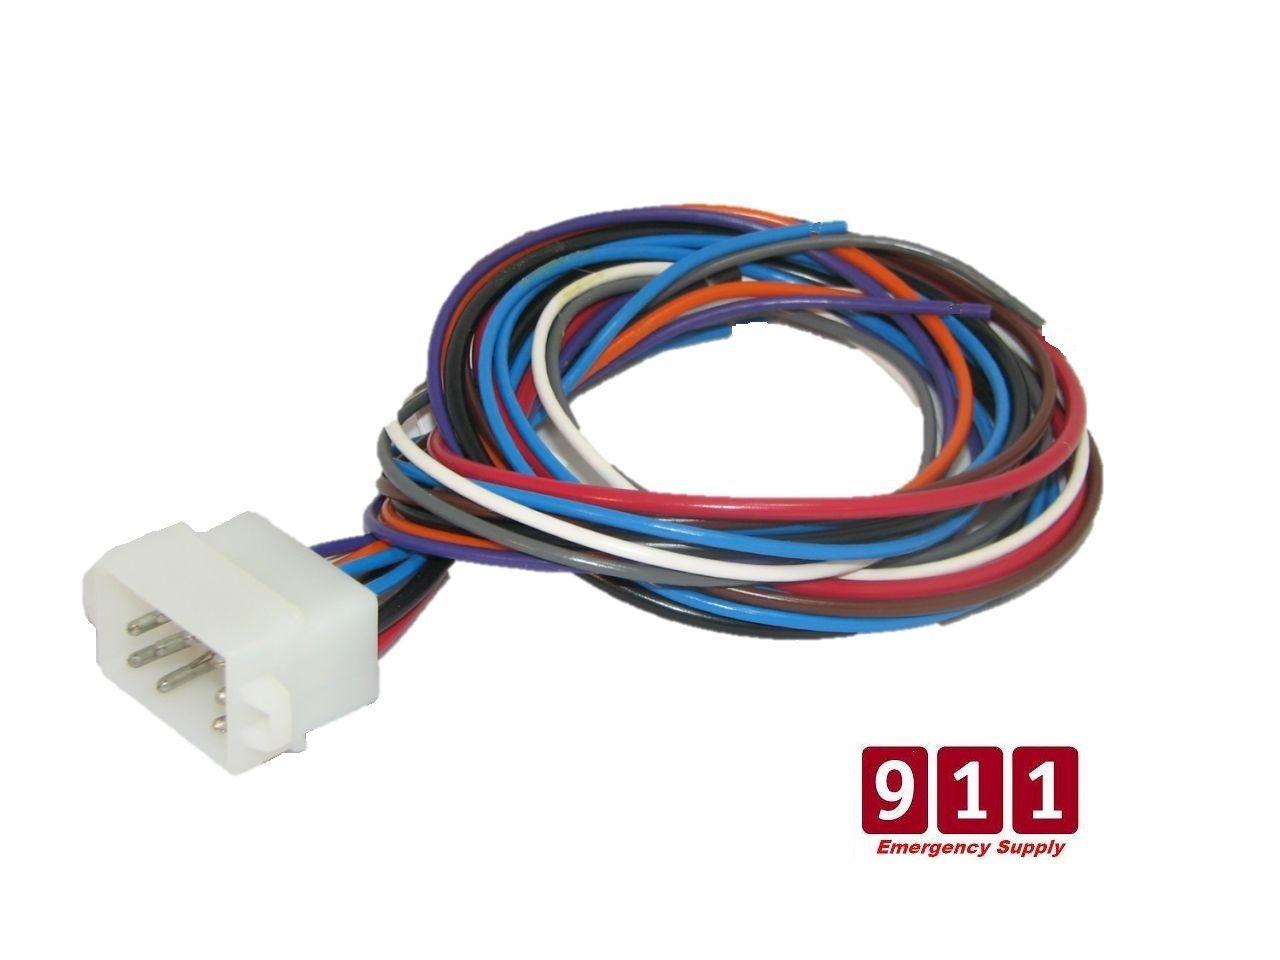 Metra 71-1677-1 Reverse Wiring Harness for 78-90 GM Vehicles 12-PIN FactoryRadio